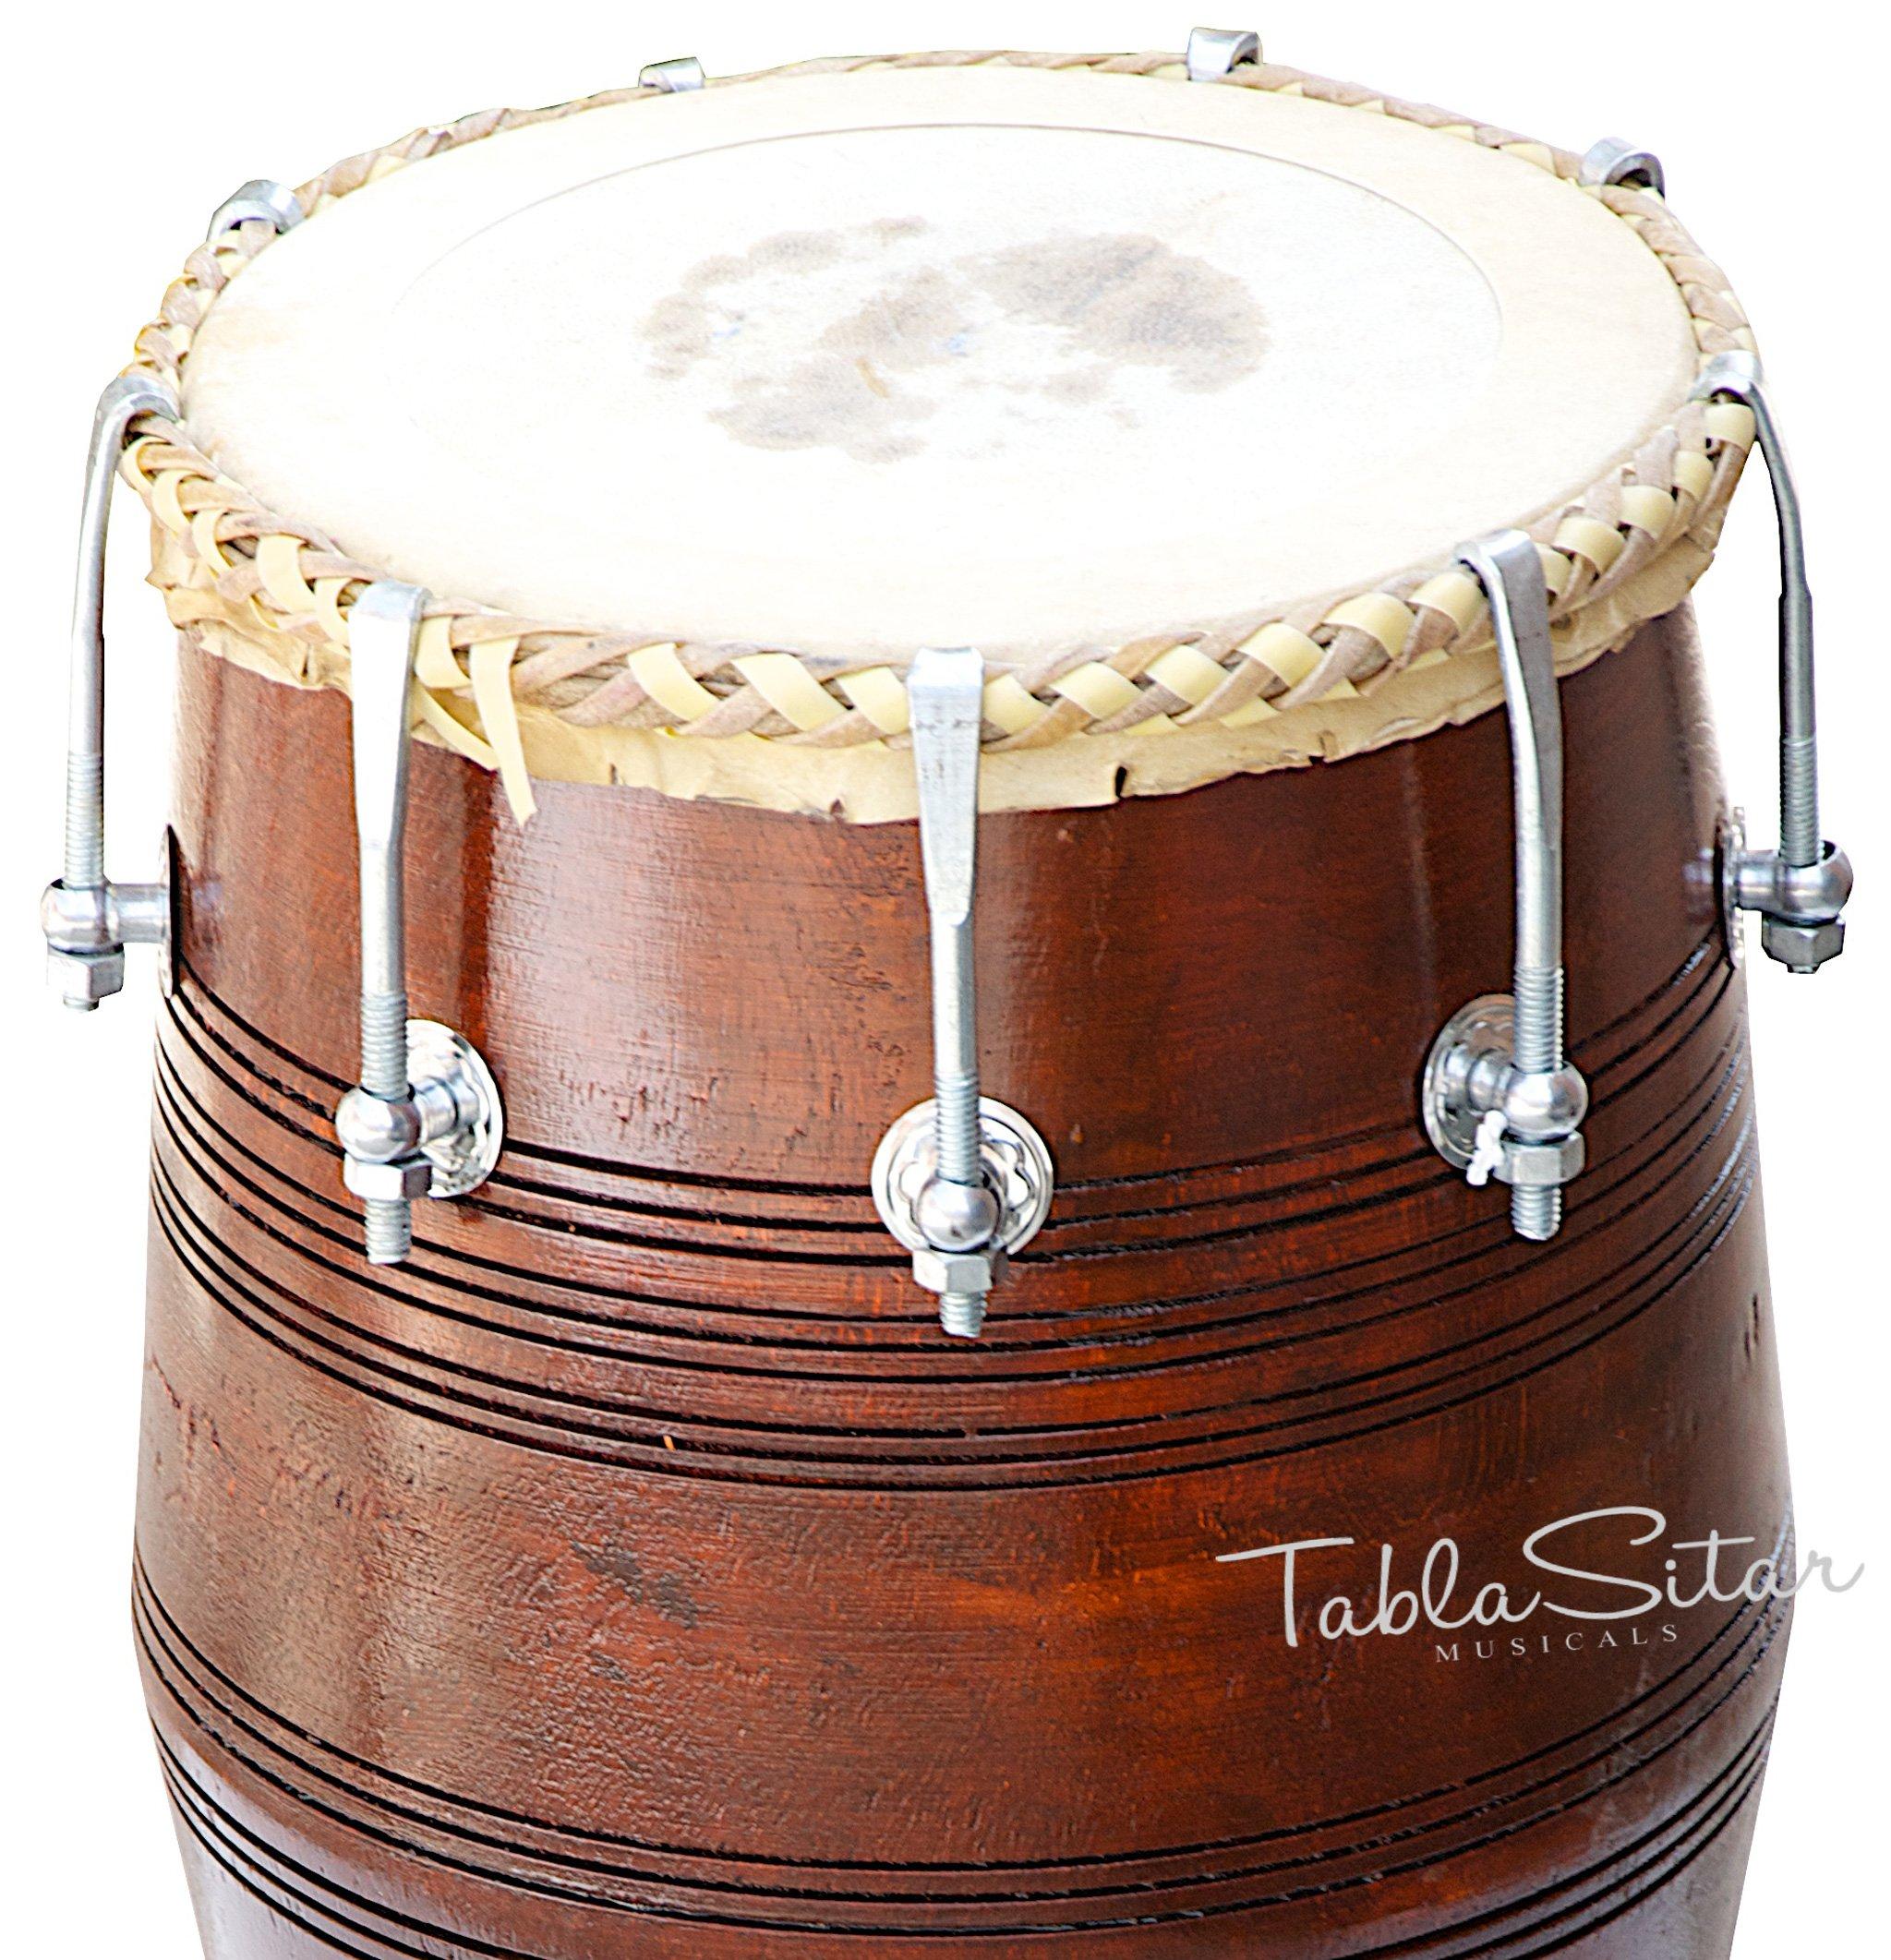 Mahraja Musicals Dholak (Dholki), Special Gajra, Mango Wood, Bolt-tuned, Padded Bag, Spanner, Dholak Drum(PDI-BGA) by Maharaja Musicals (Image #6)